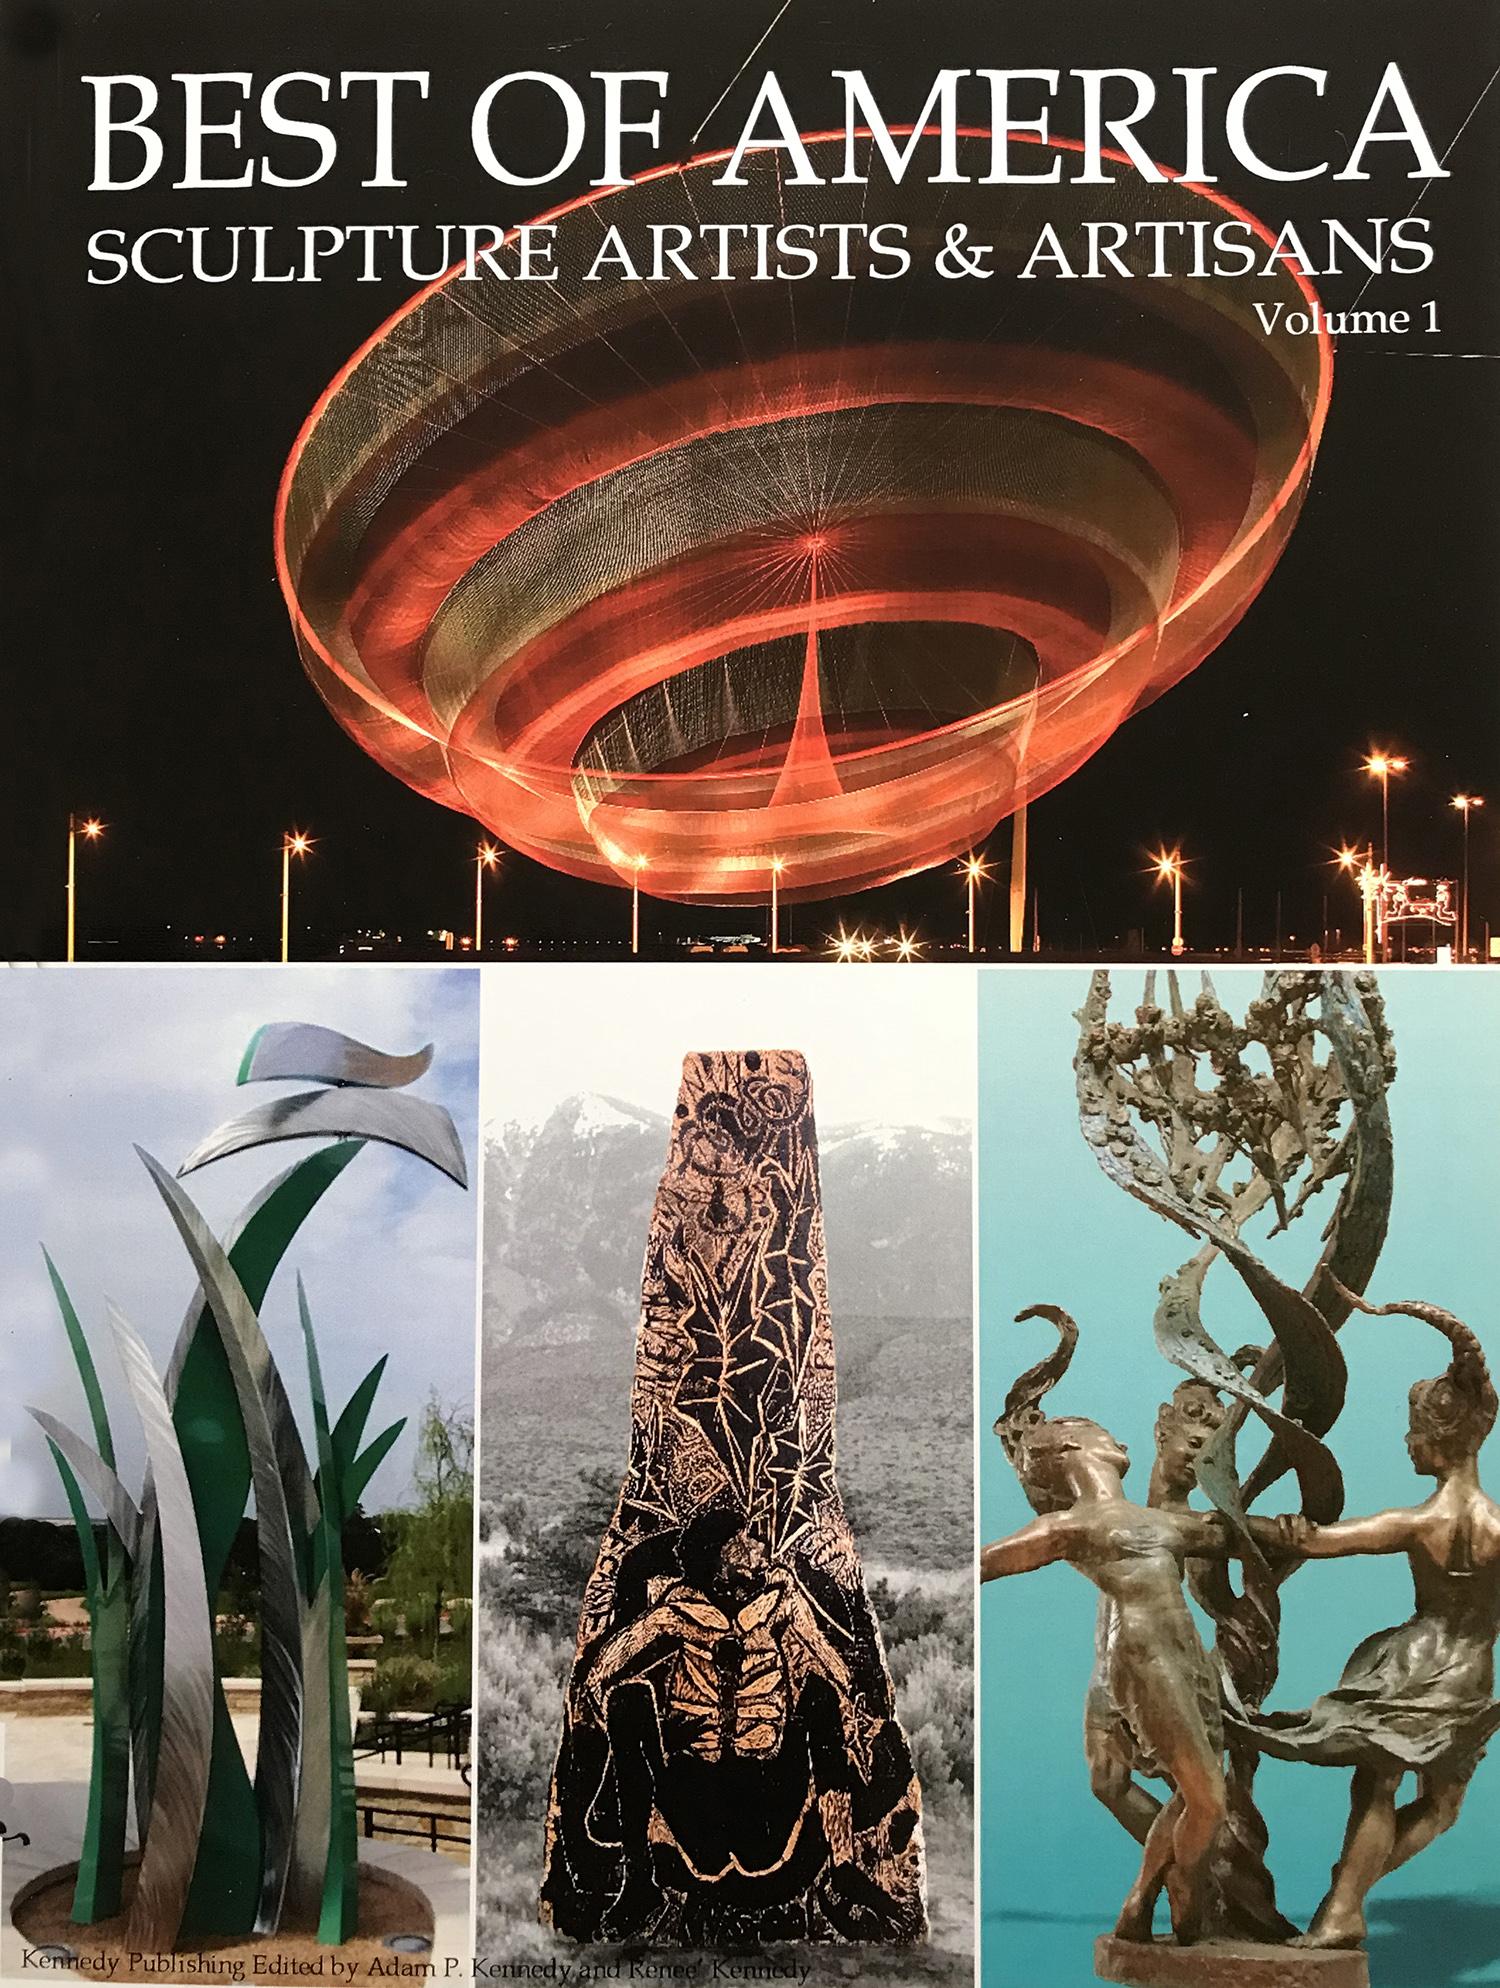 book-bestofamerica-sculpture-artists-artisans-volume1-kennedypublishing-williamsburg,va-2007.jpg